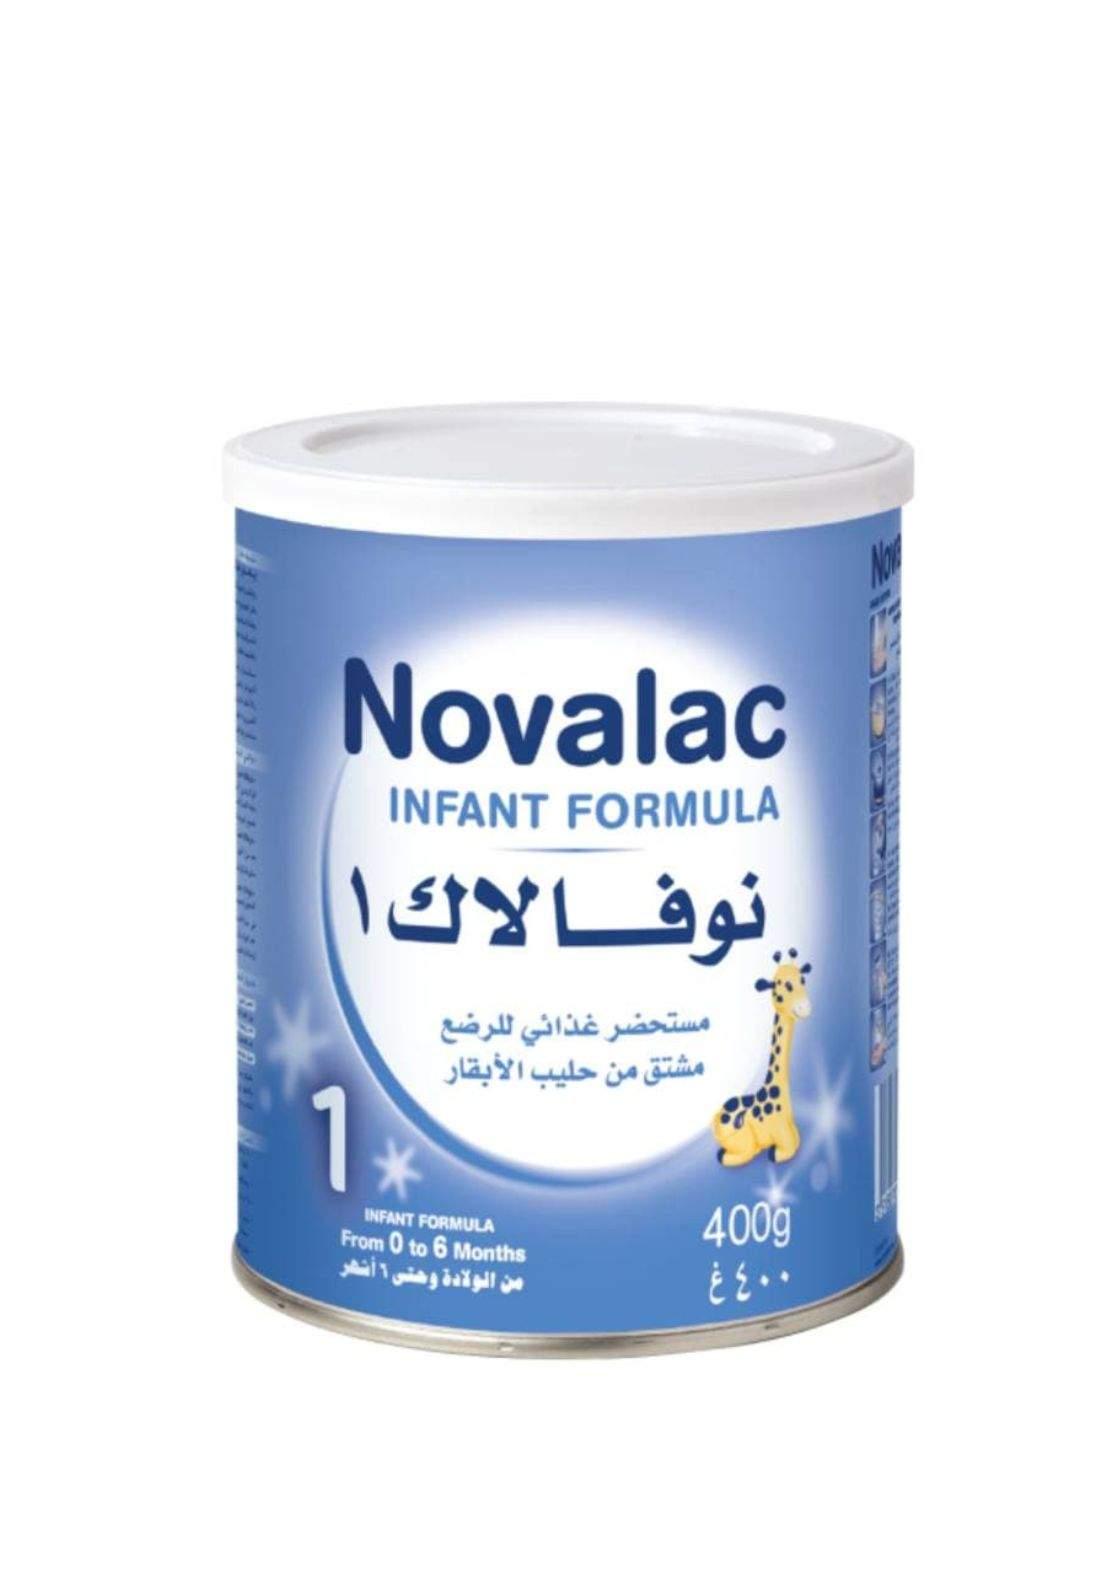 Novalac power milk 400g نوفالاك  حليب اطفال